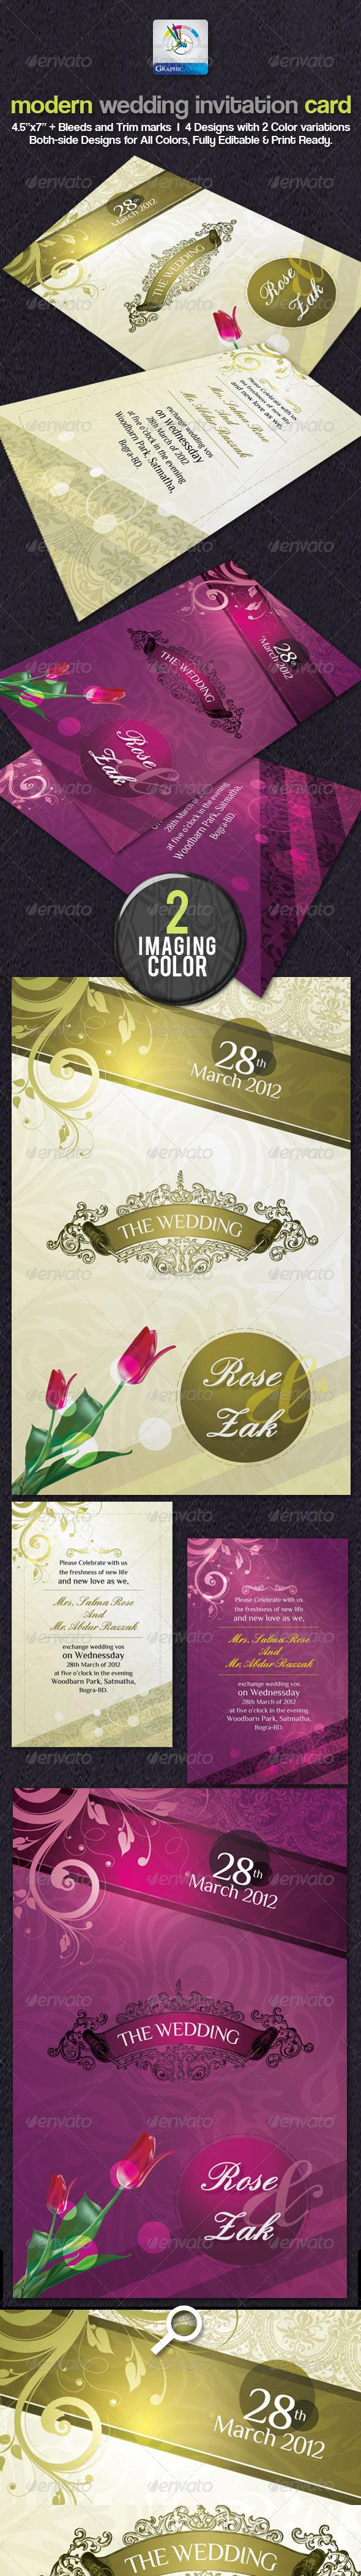 Modern Wedding Invitation Cards - Weddings Cards & Invites